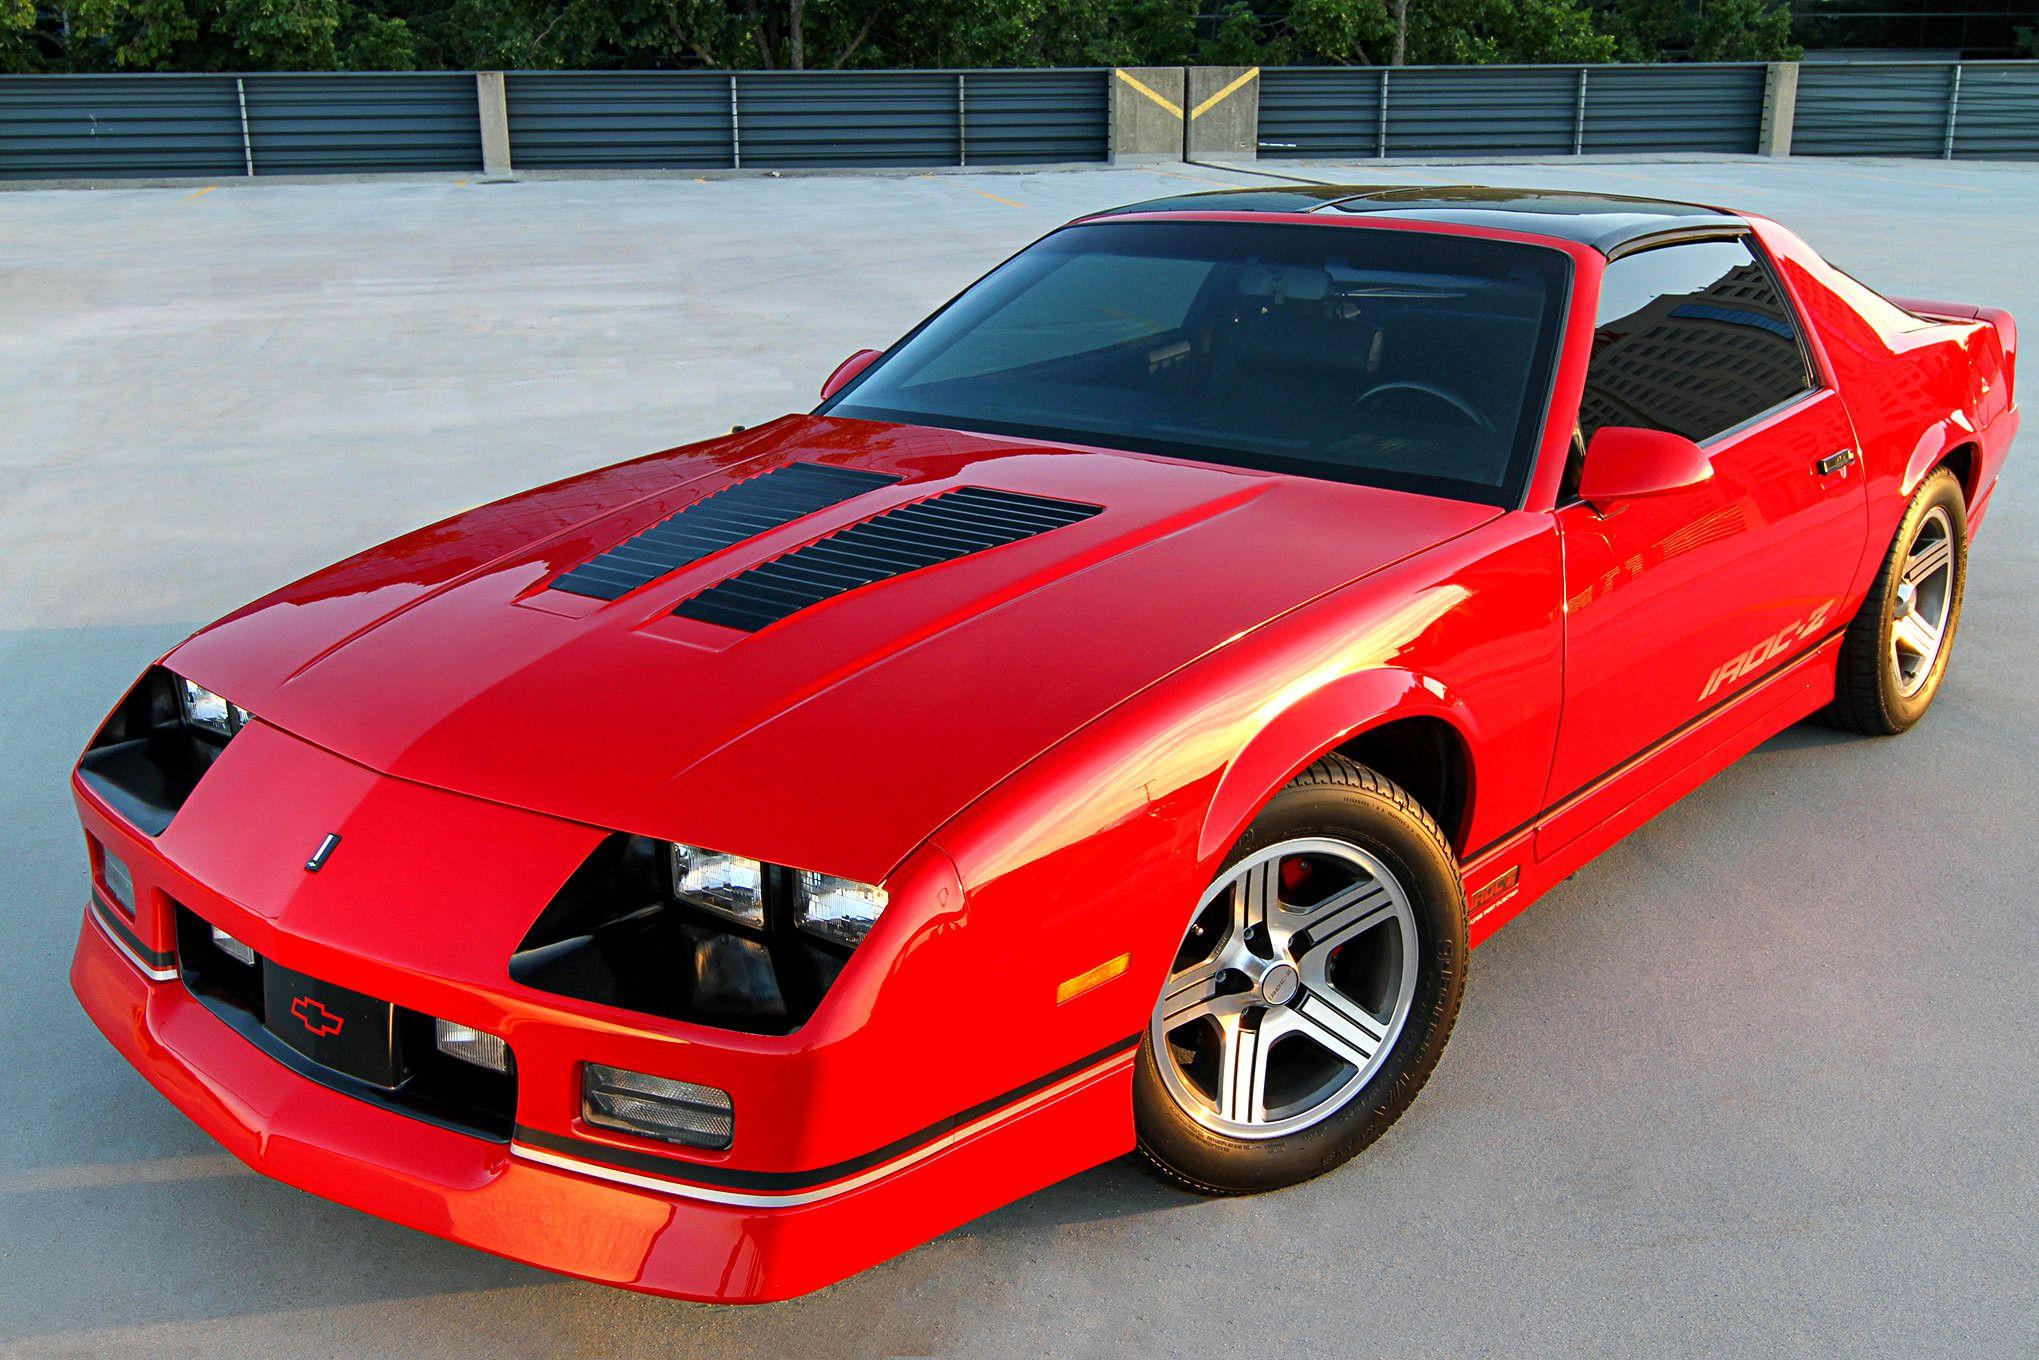 1988 90 chevrolet camaro iroc z t top camaro car camaro iroc camaro 1988 90 chevrolet camaro iroc z t top